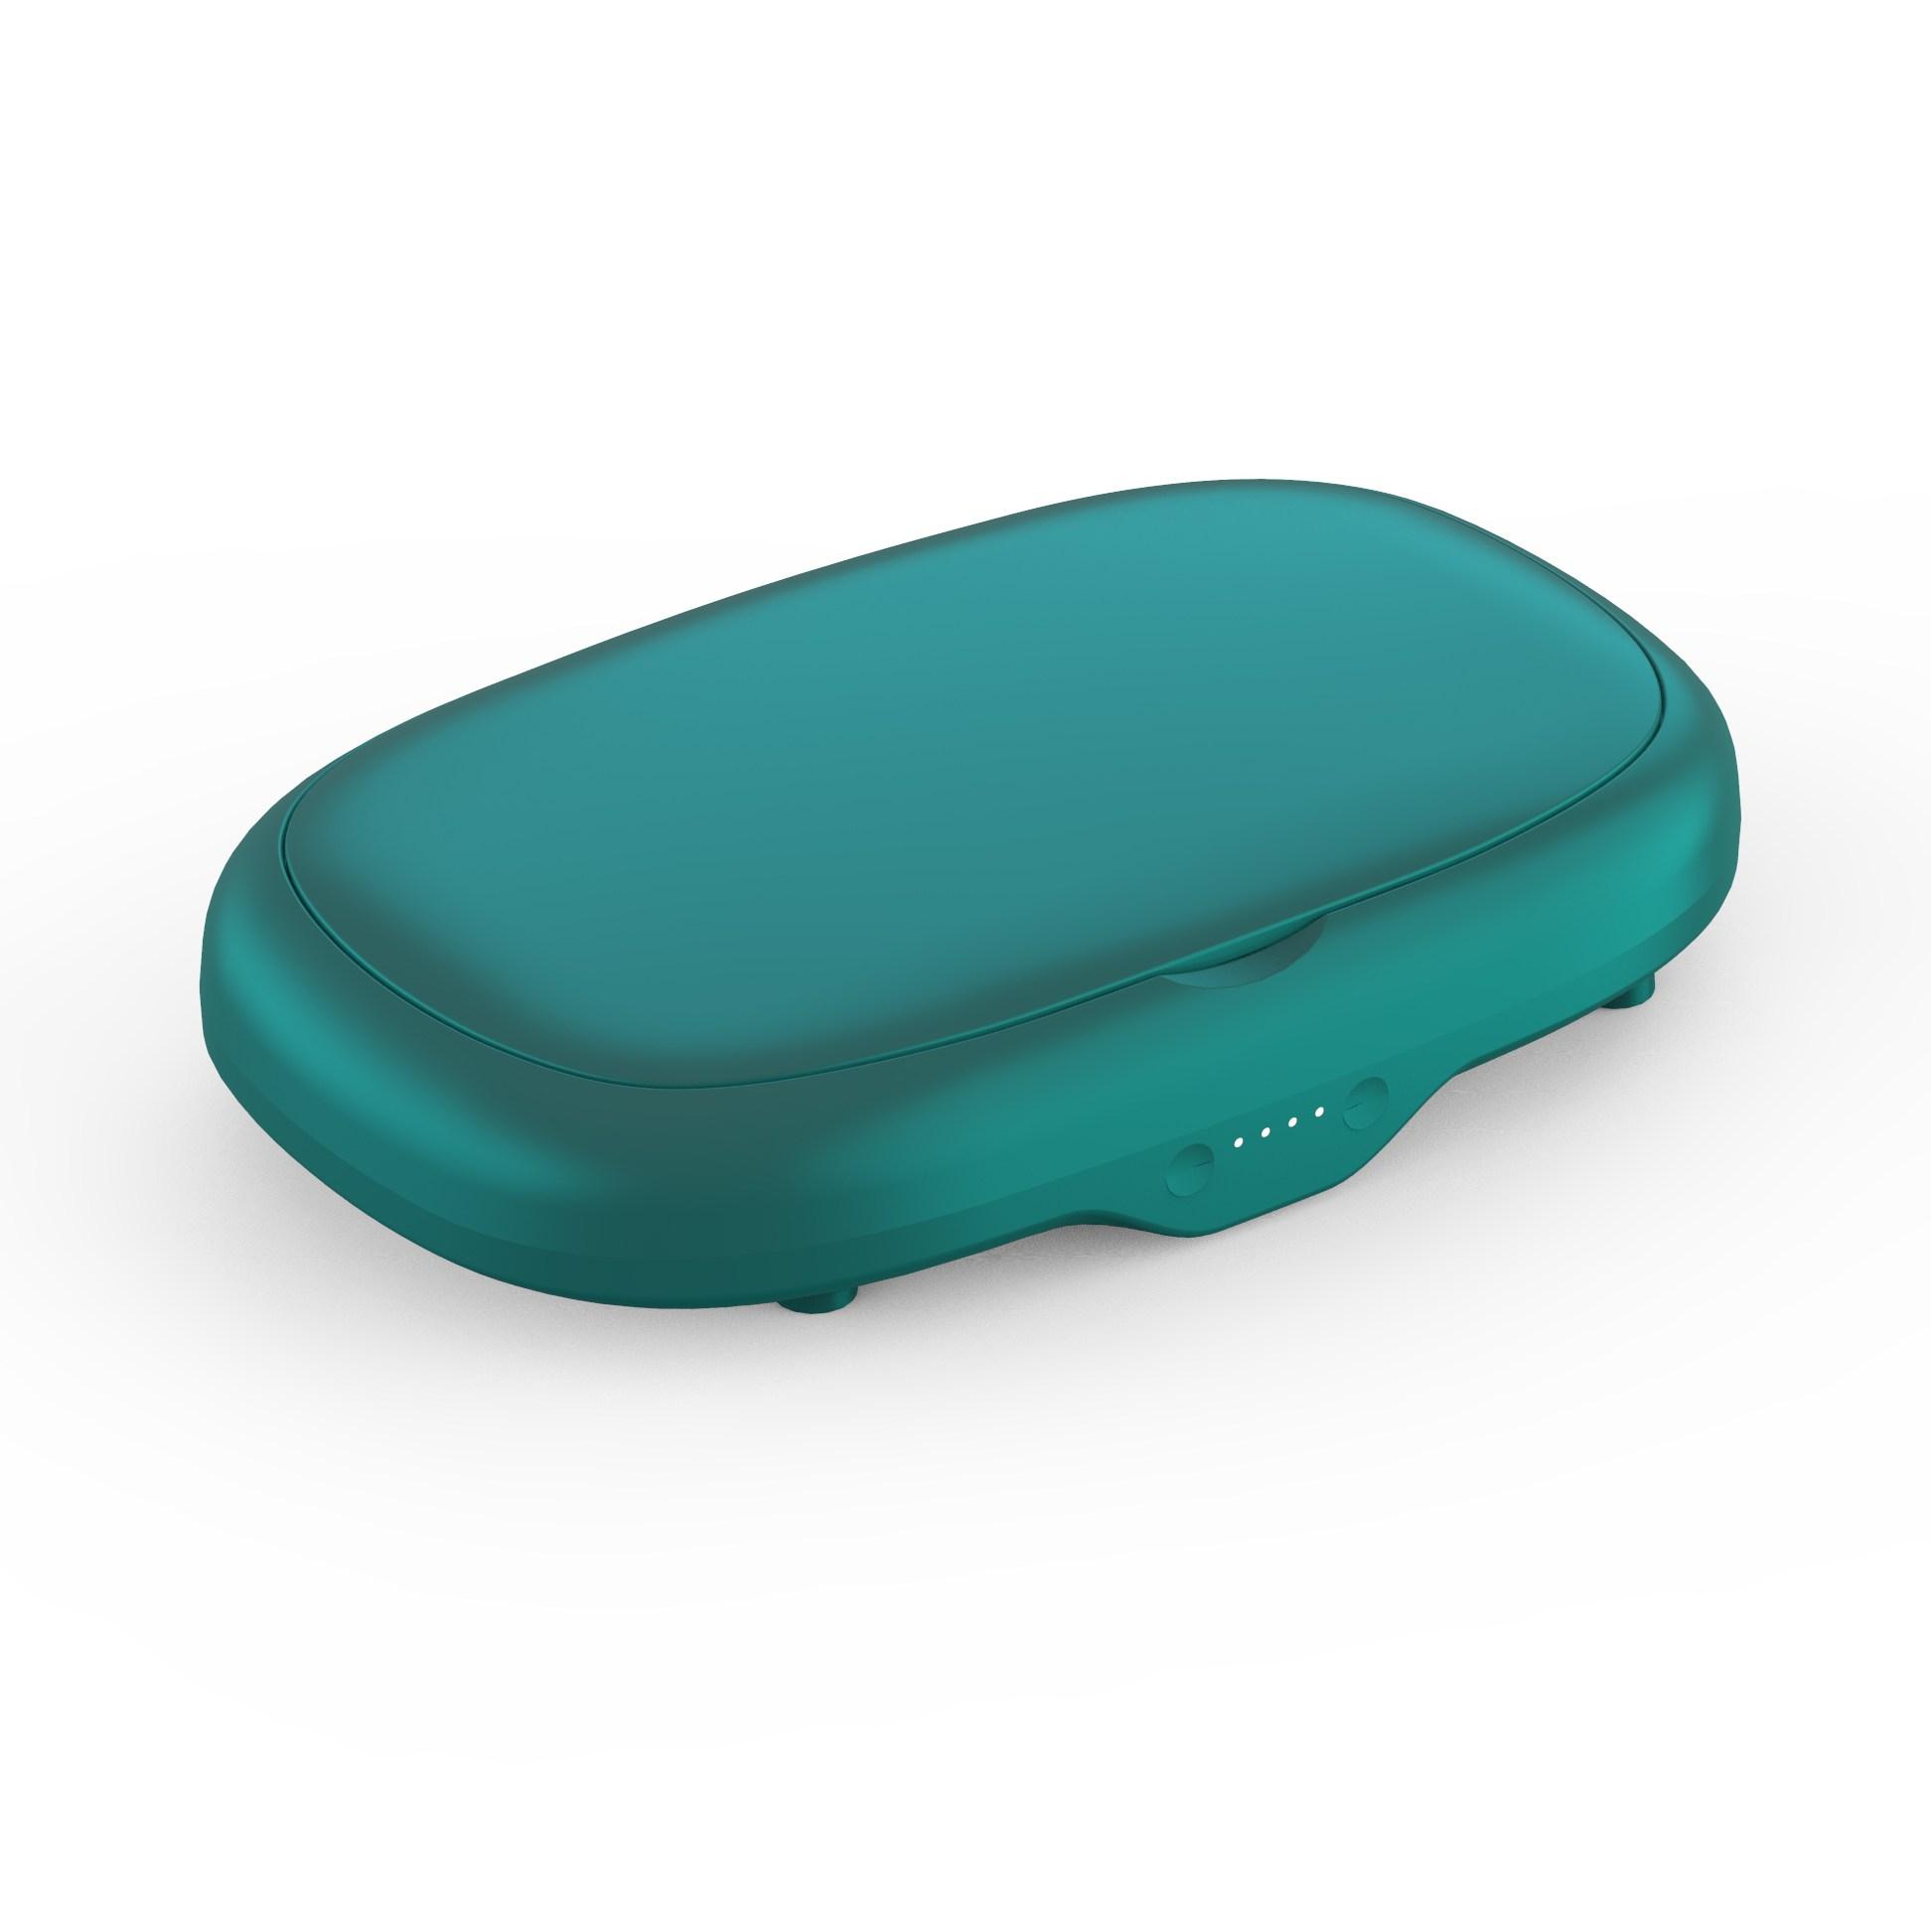 uv sterilizer 자외선 살균기 소독기 멸균기 자외선 마스크 소독 케이스 소형 휴대전화 안경 다기능 무선충전 휴대용 uv 오존 살균기, 3.녹색